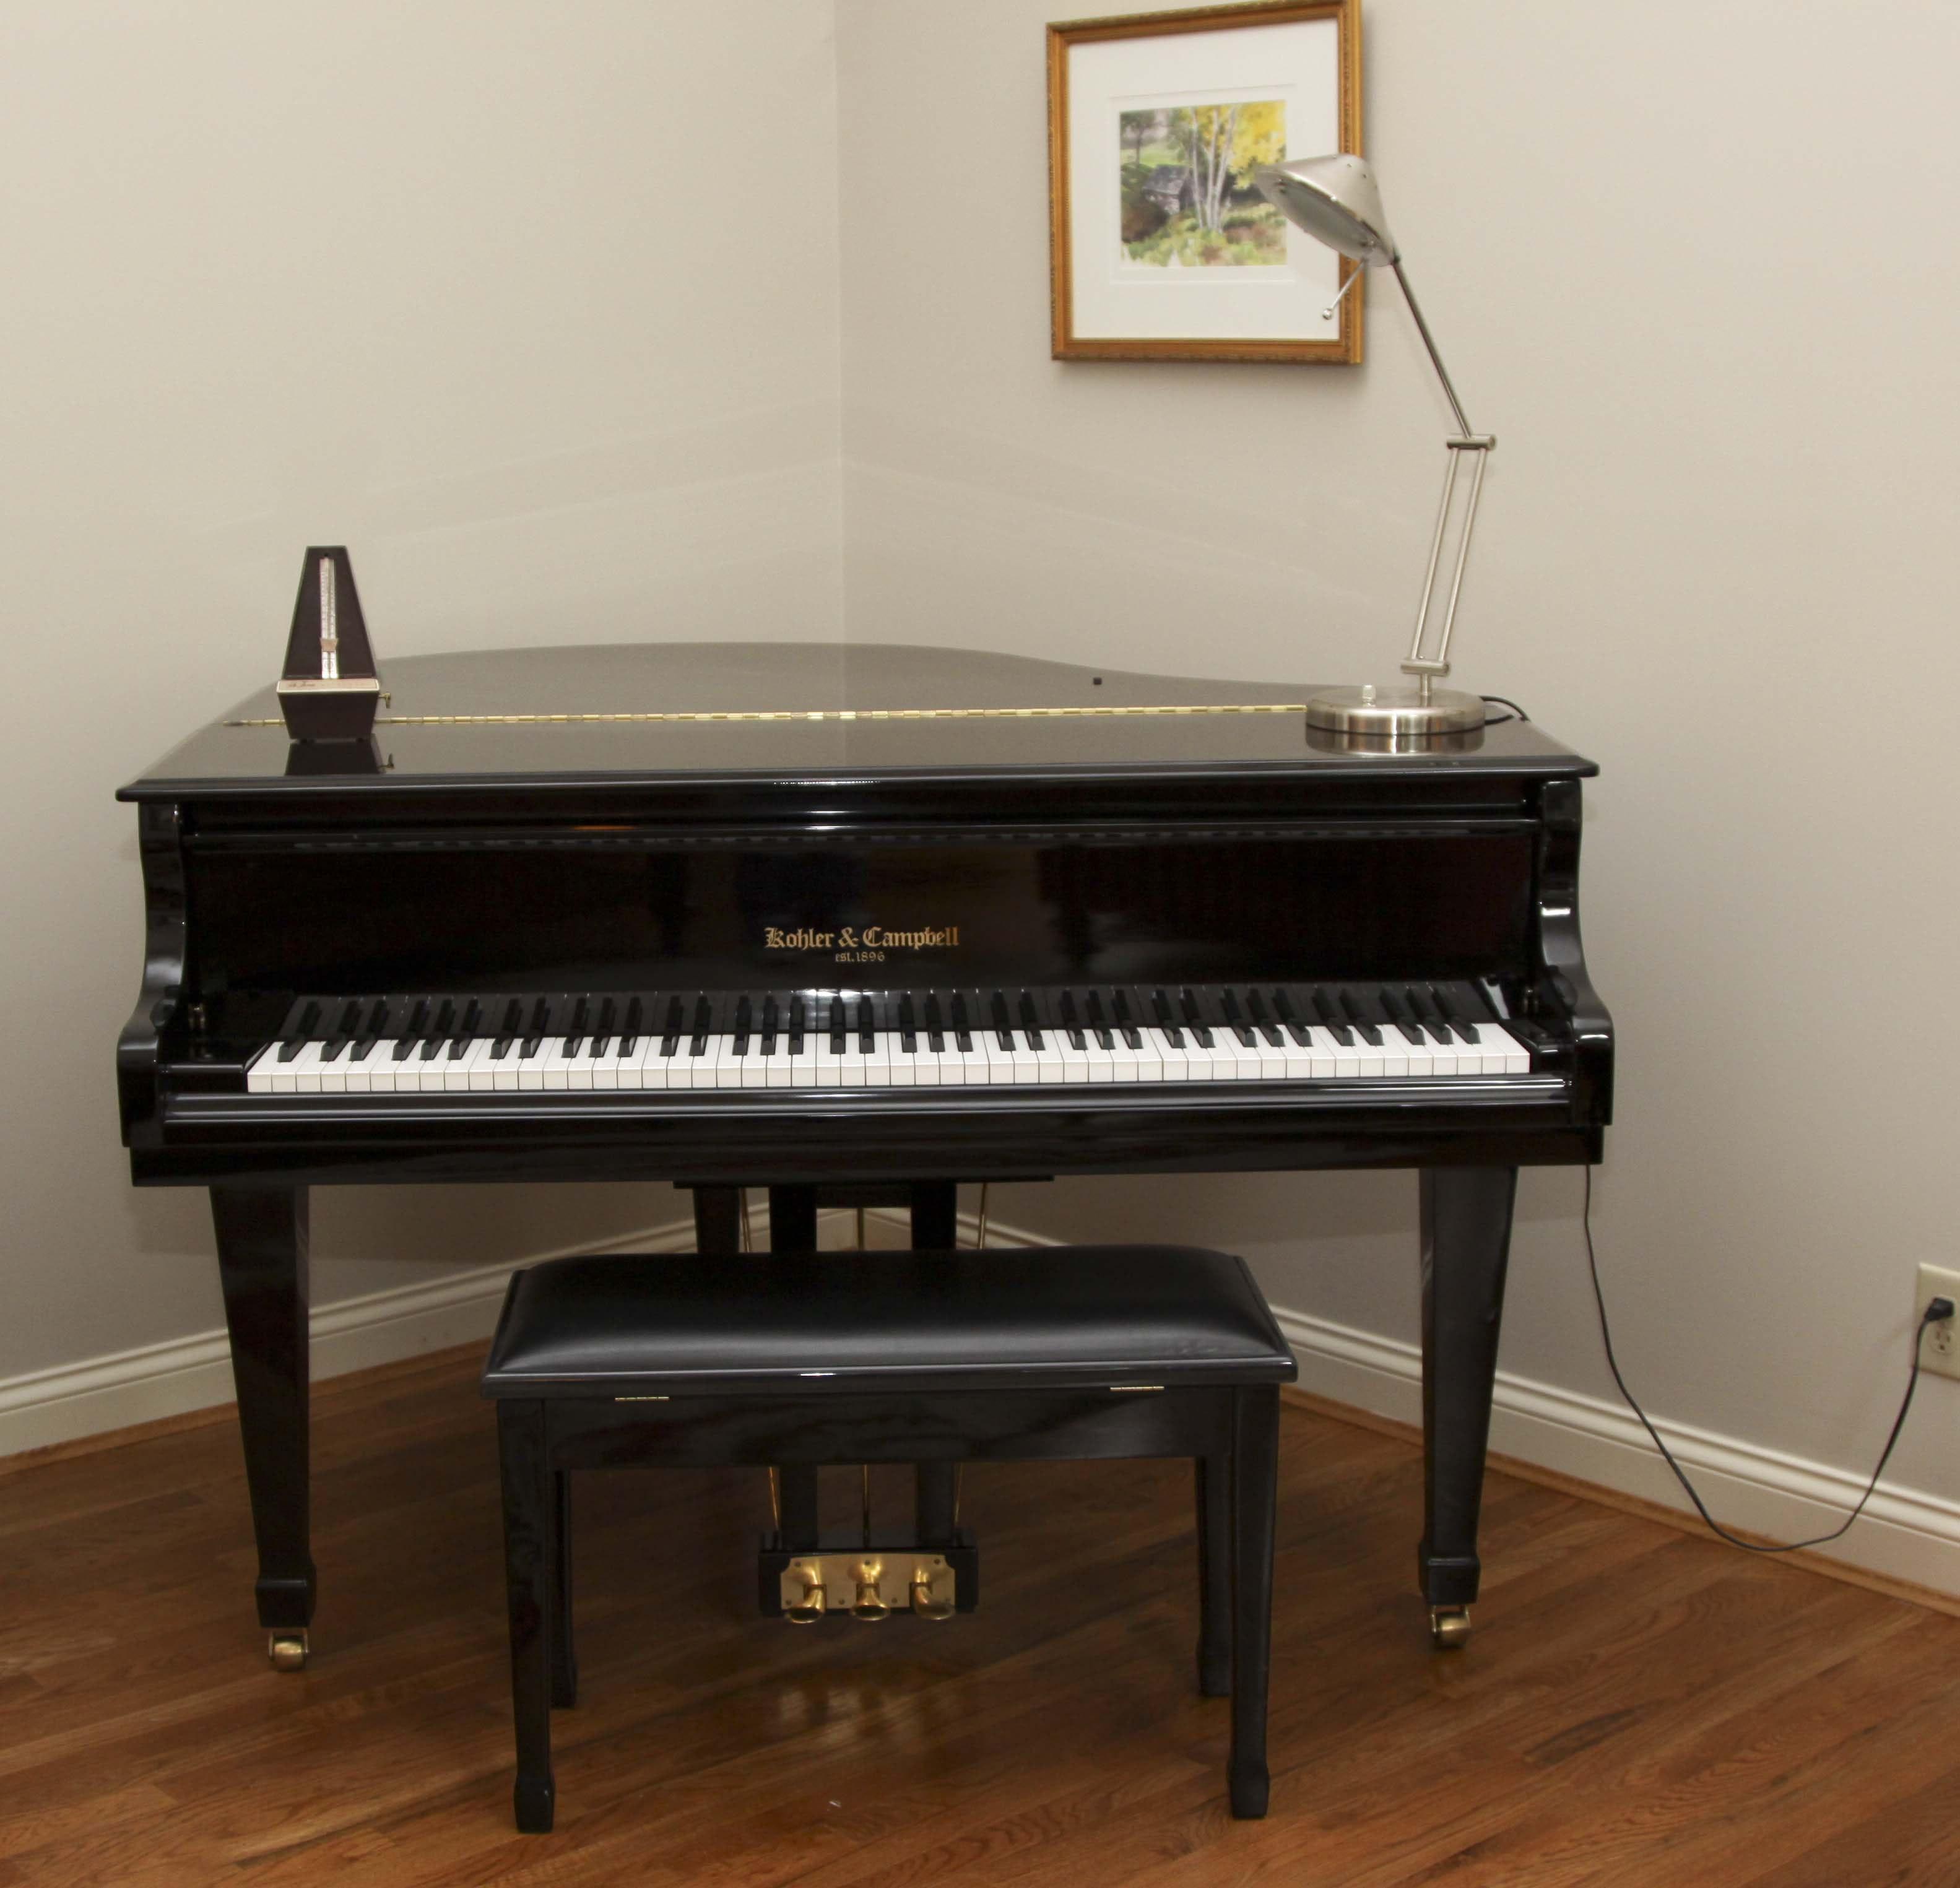 Kohler & Campbell Baby Grand Piano, Lamp and Seth Thomas Metronome